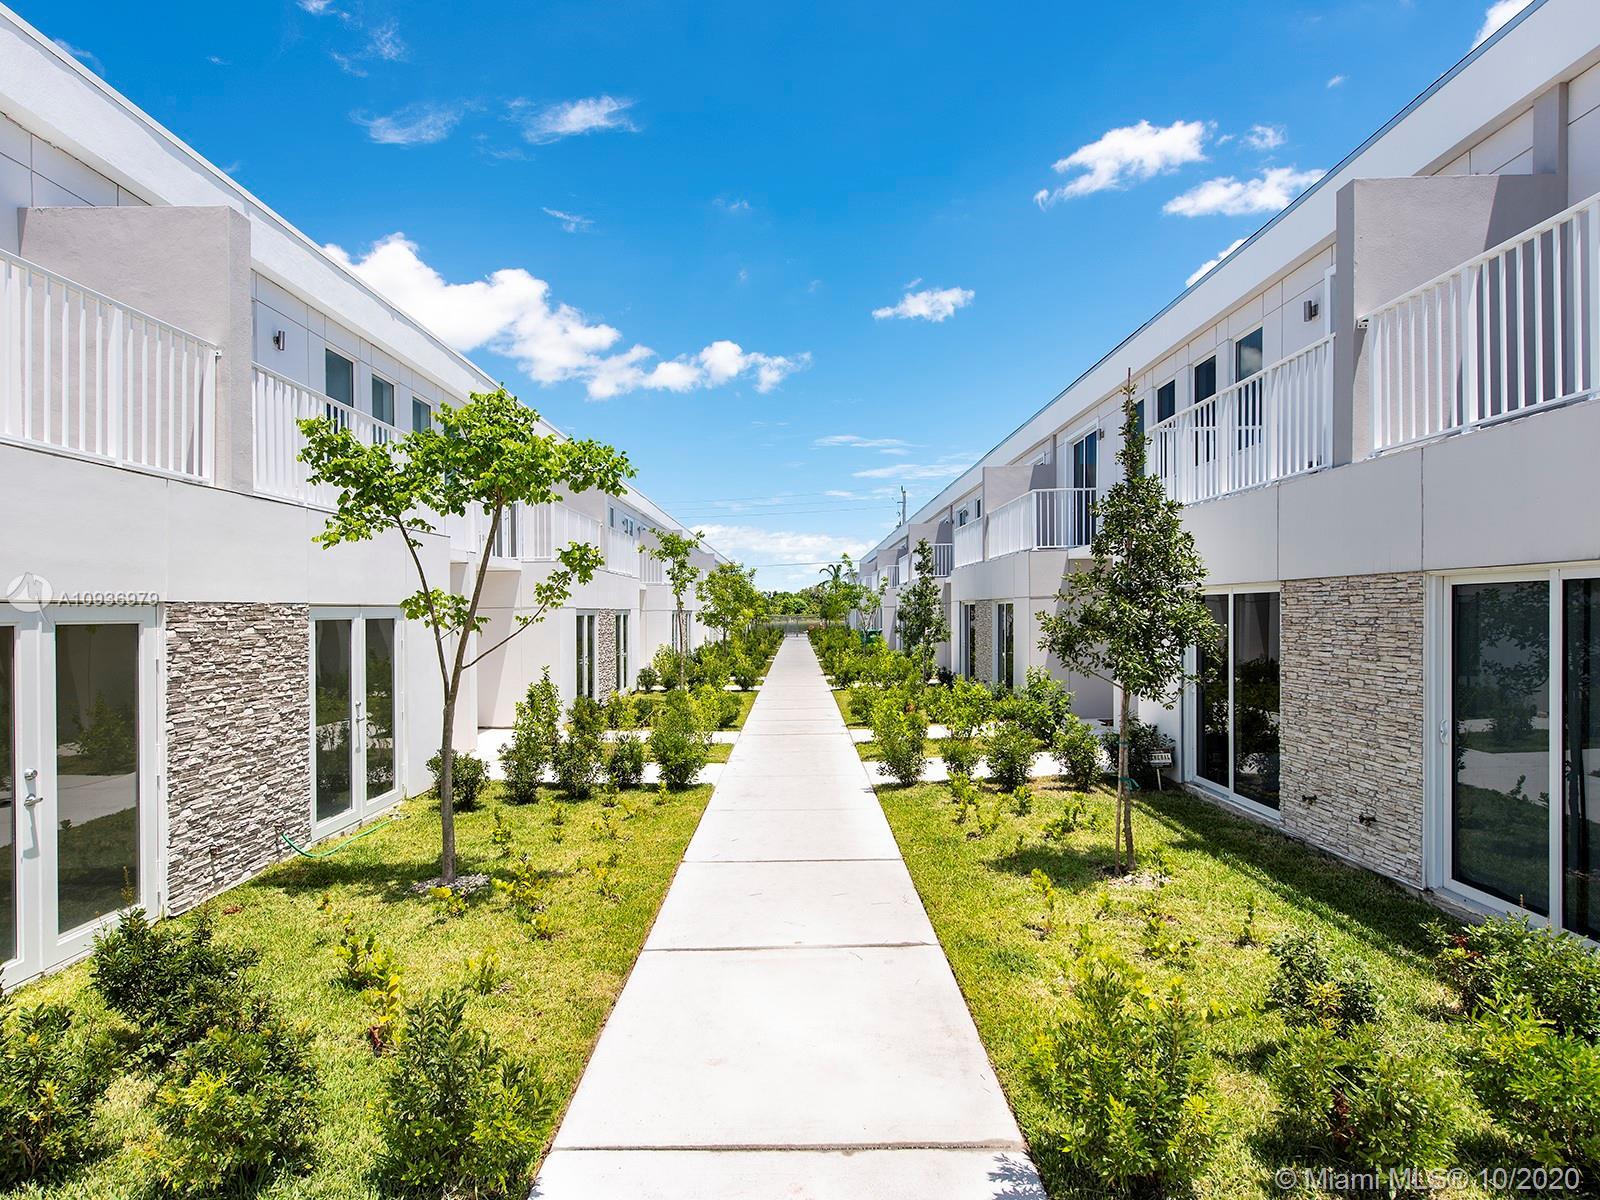 13720 Sw 259 St Property Photo